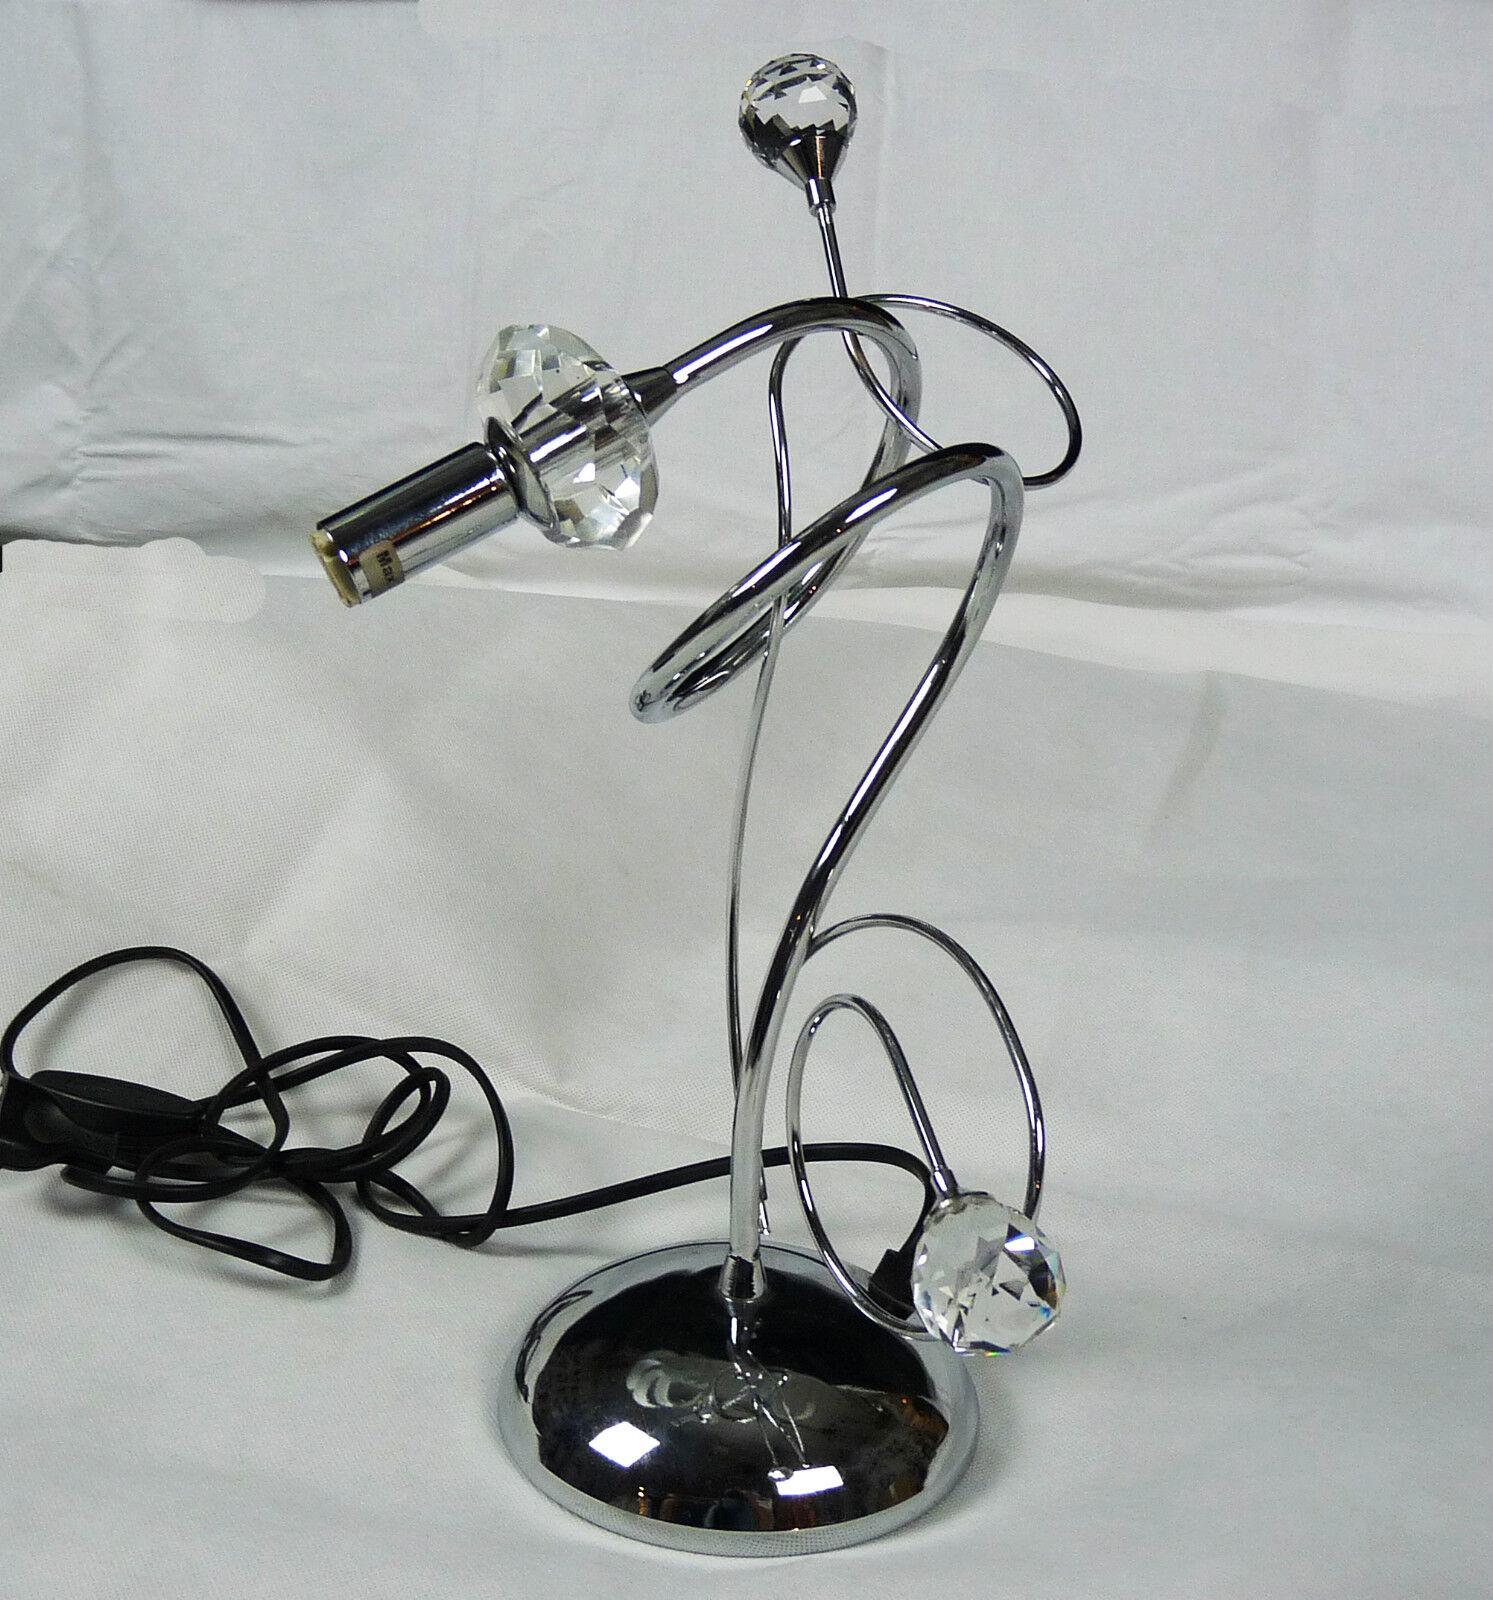 LUME LED MODERNO CONTEMPORANEO CROMO CRISTALLO ART.L59 MADE IN ITALY TABLE LAMP